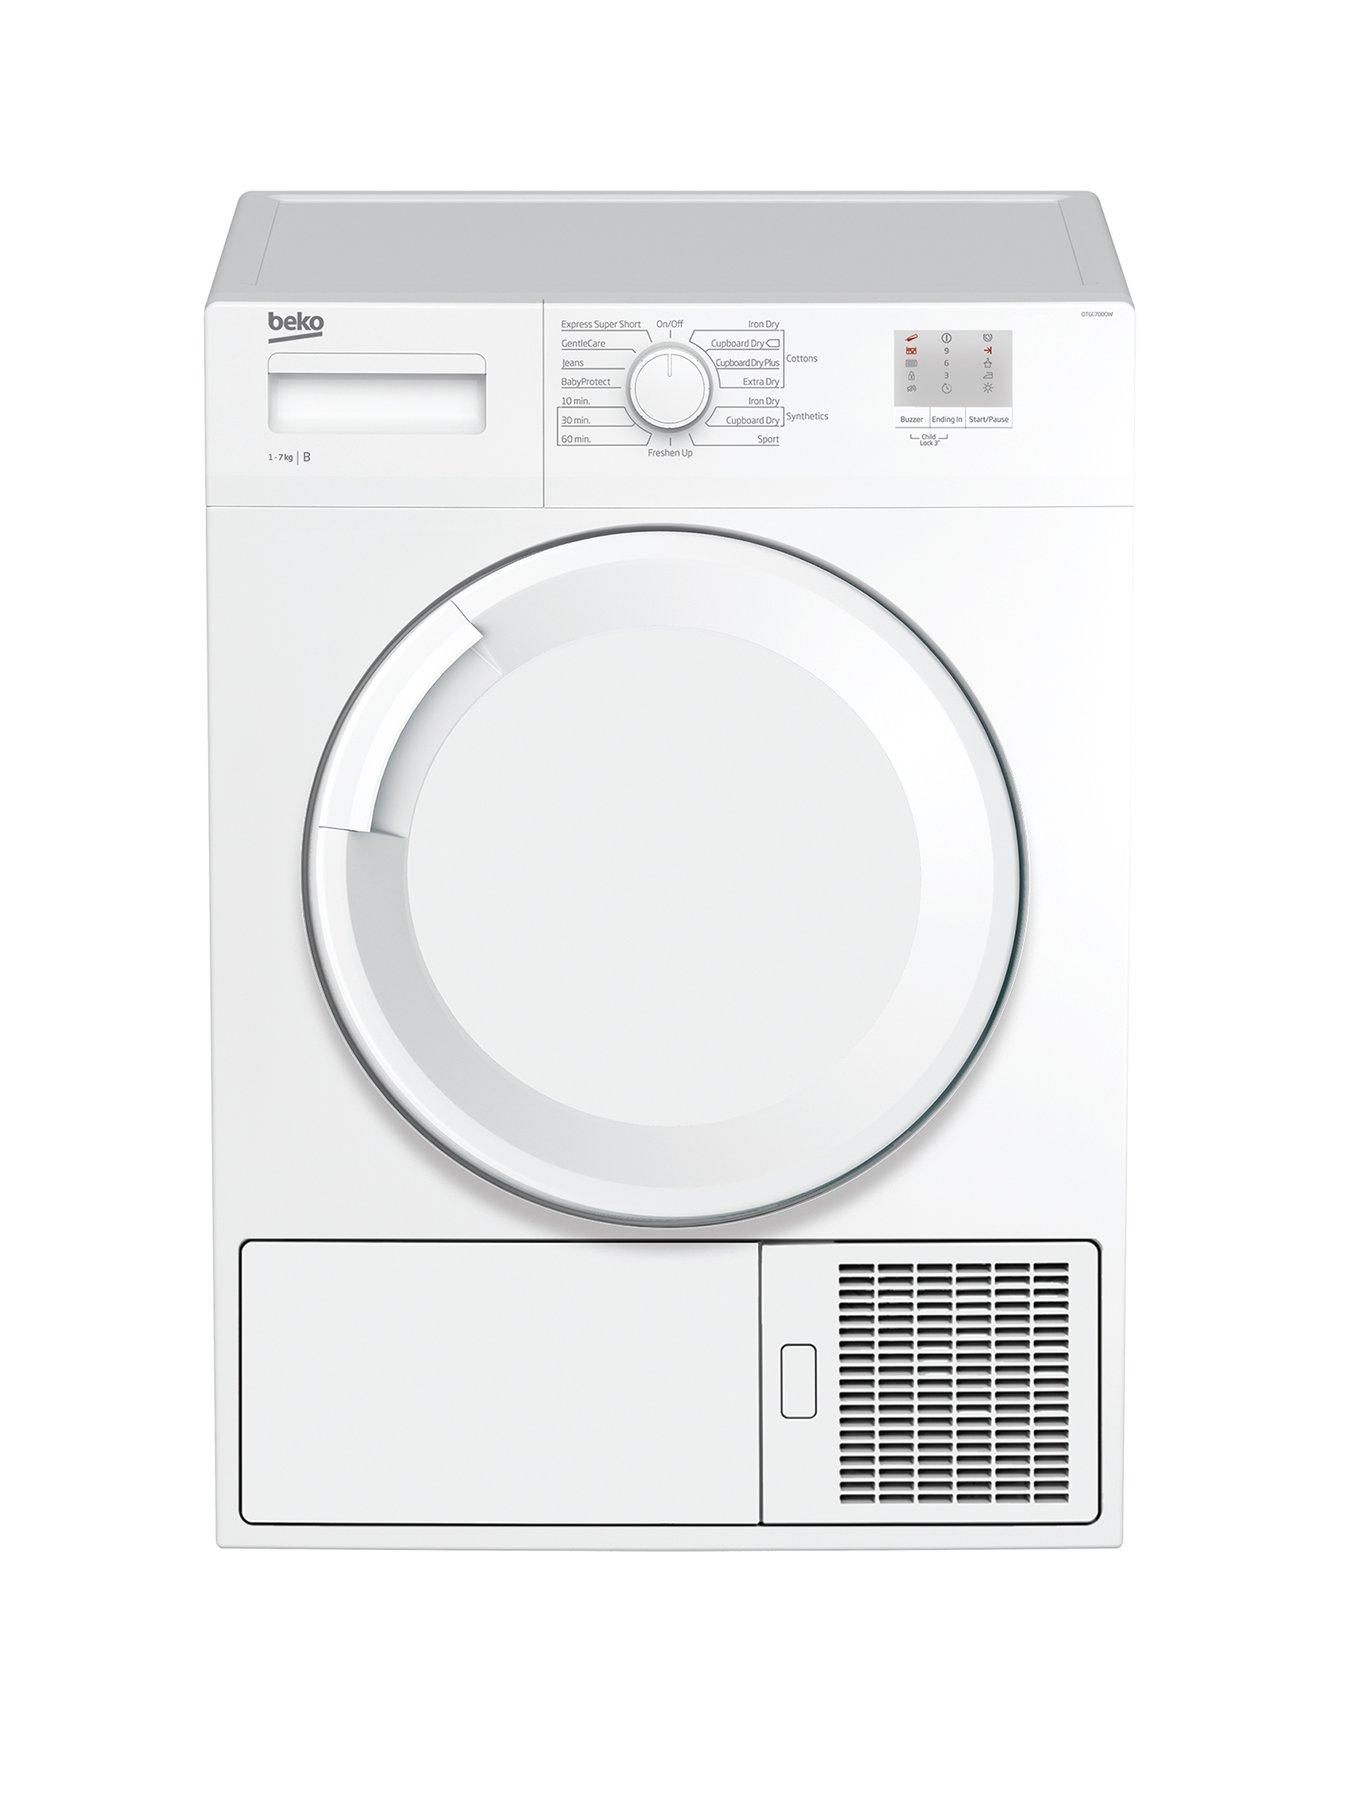 Beko Dtgc7000w Tumble Dryer Appliance Spotter